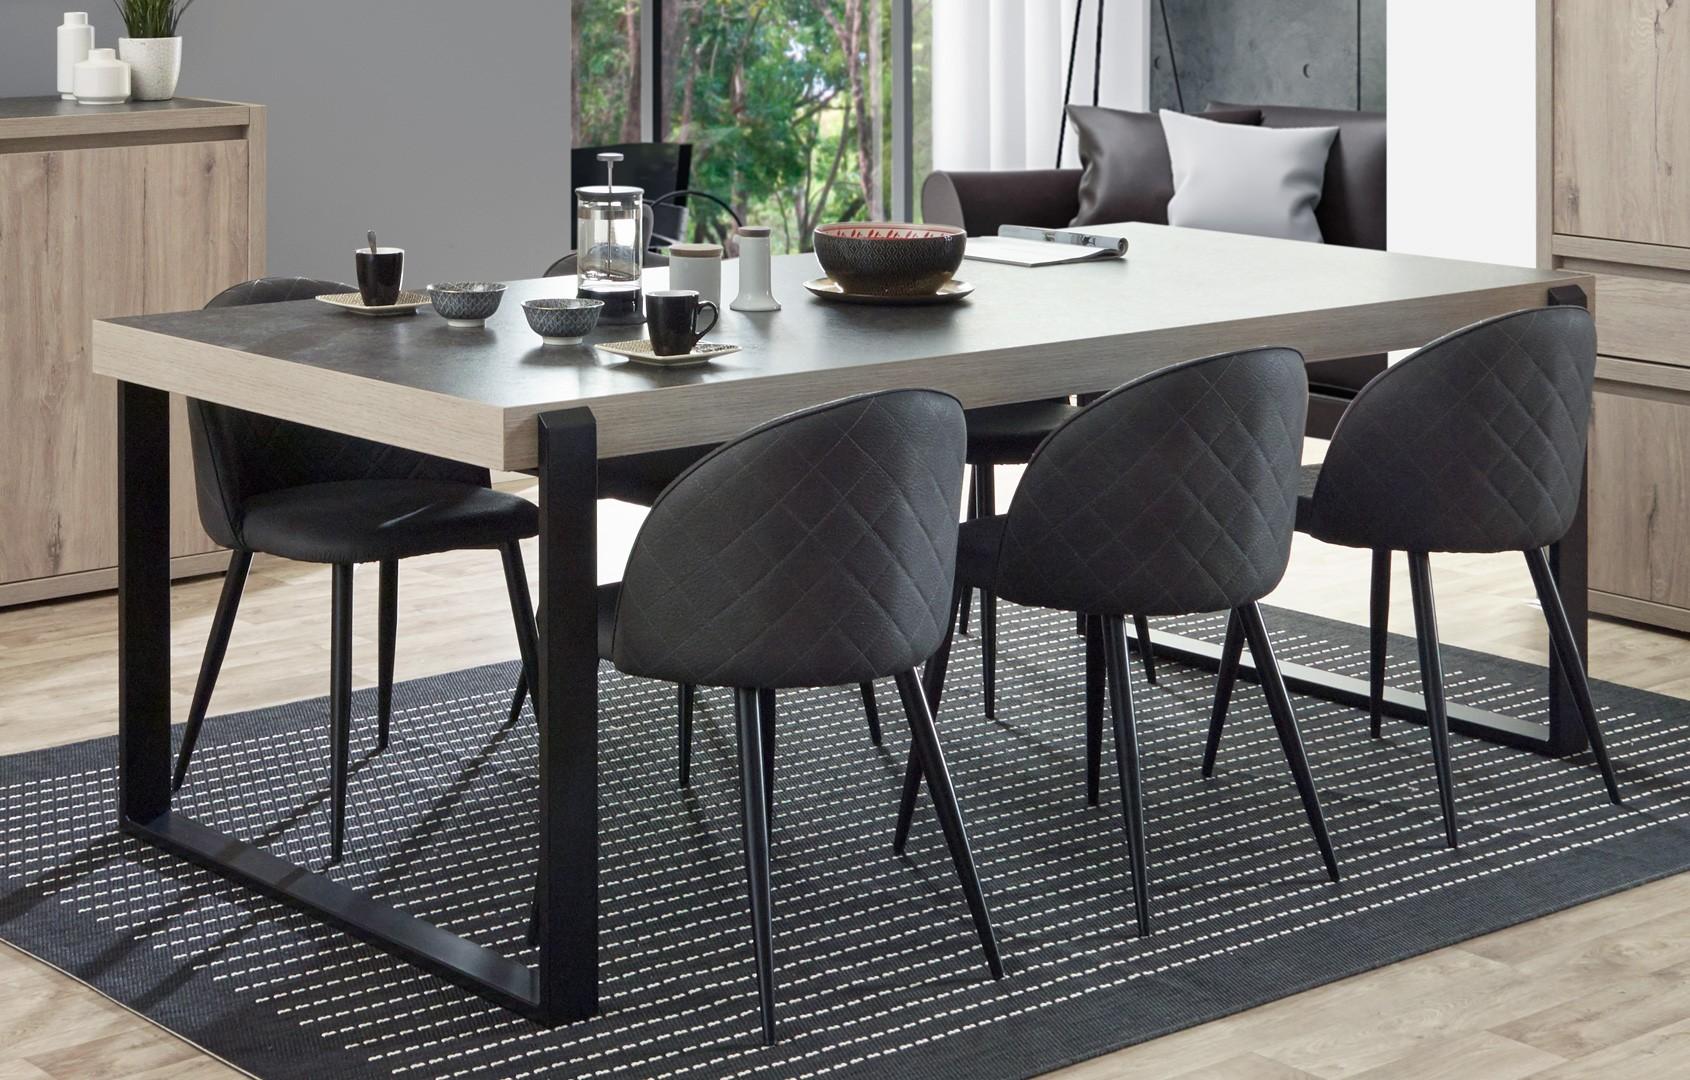 table de salle a manger contemporaine chene clair gris beton california